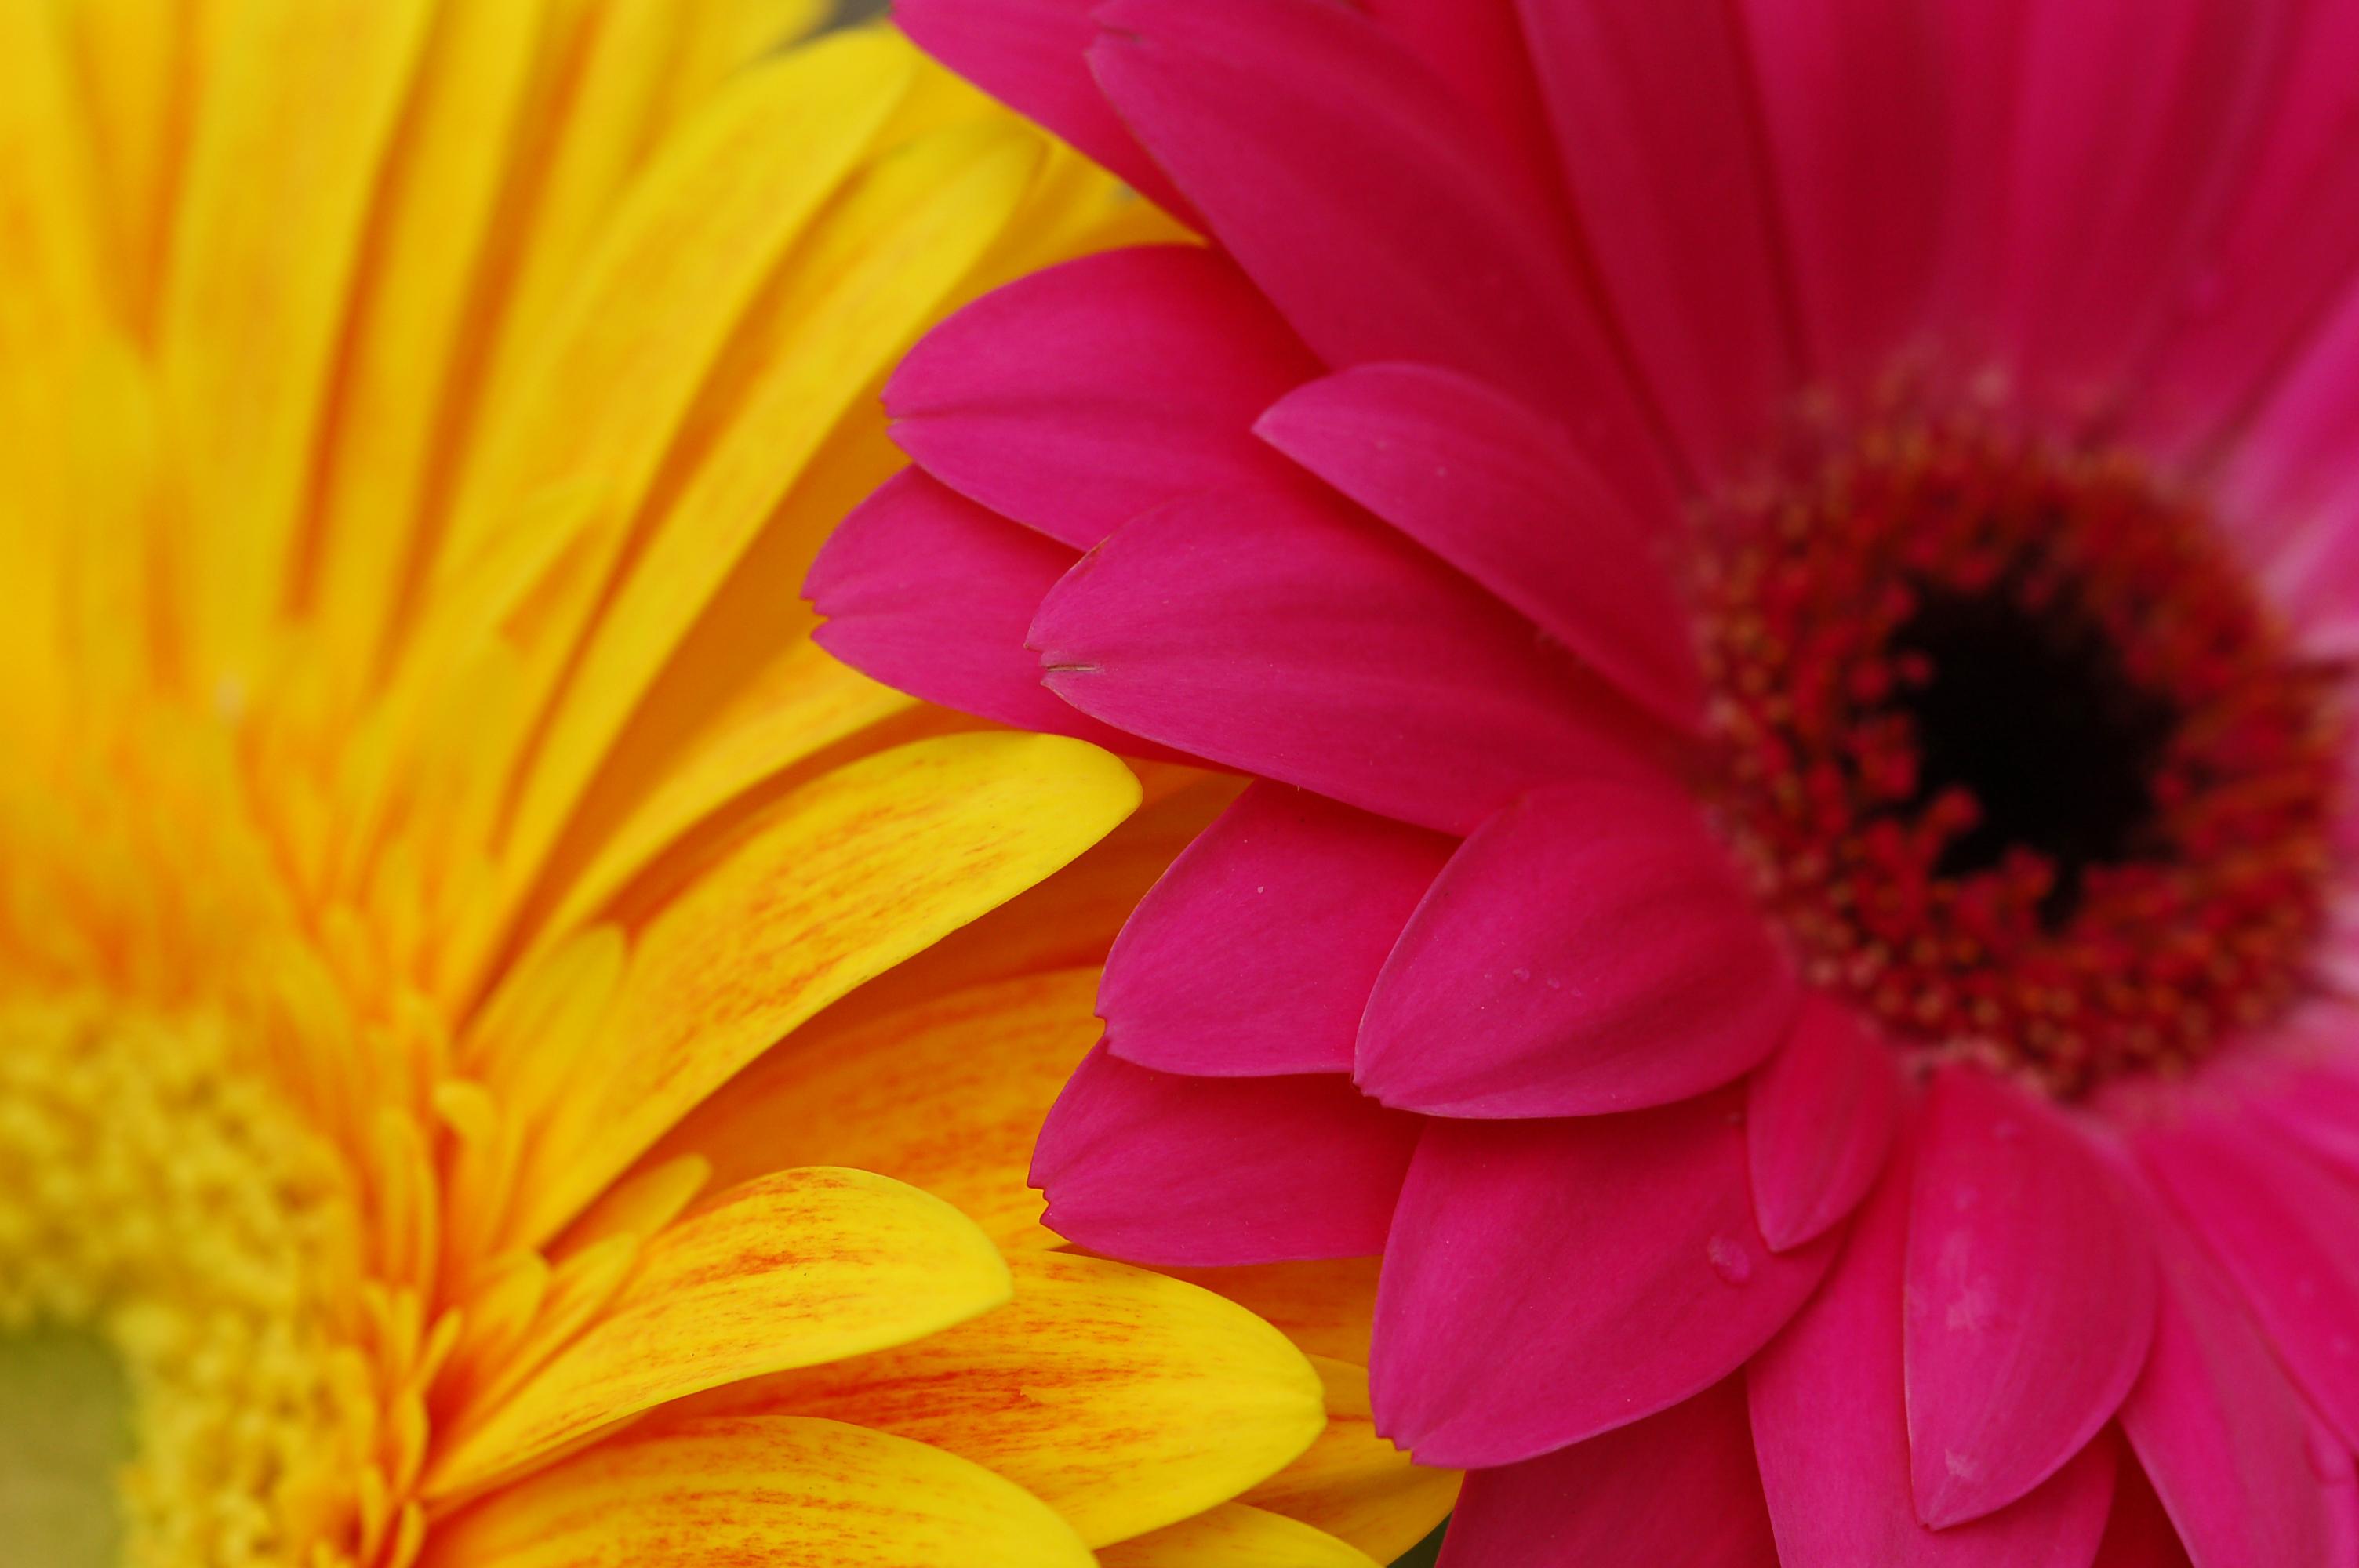 Bright Yellow And Pink Daisy Petals Nat Design Bundles